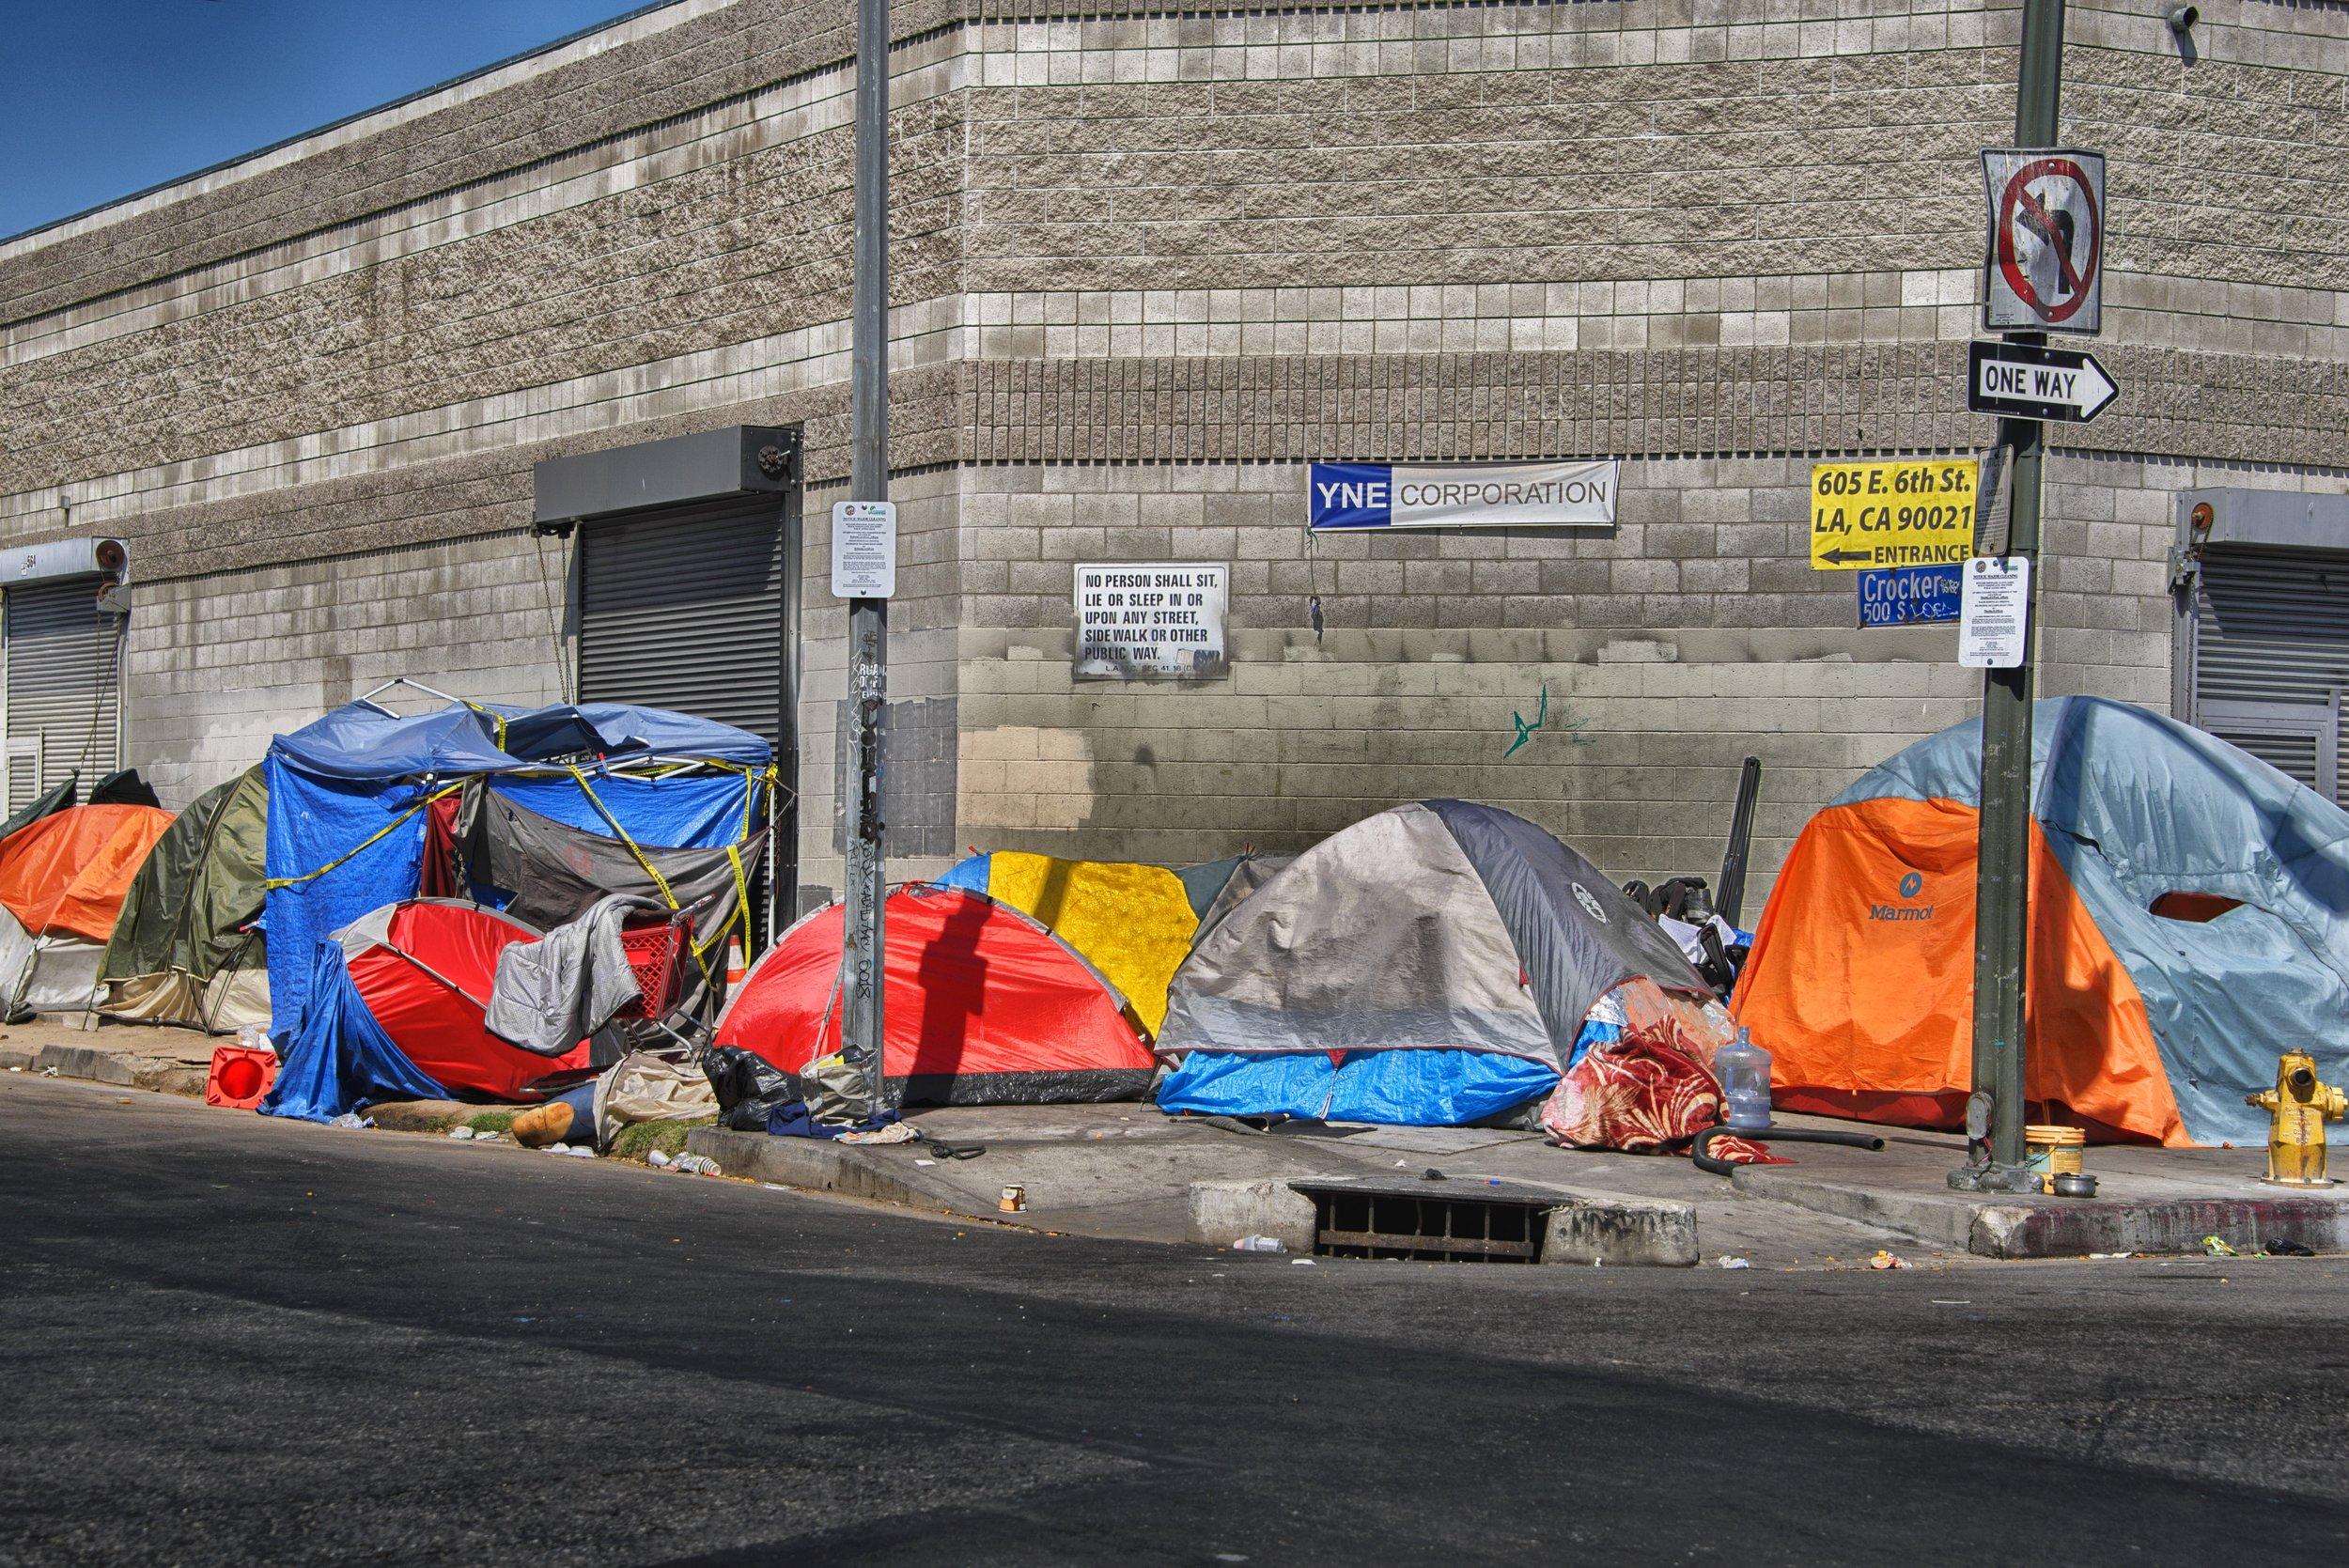 Tent city in Skid Row in Los Angeles, CA. (Photo by:  Russ Allison Loar )